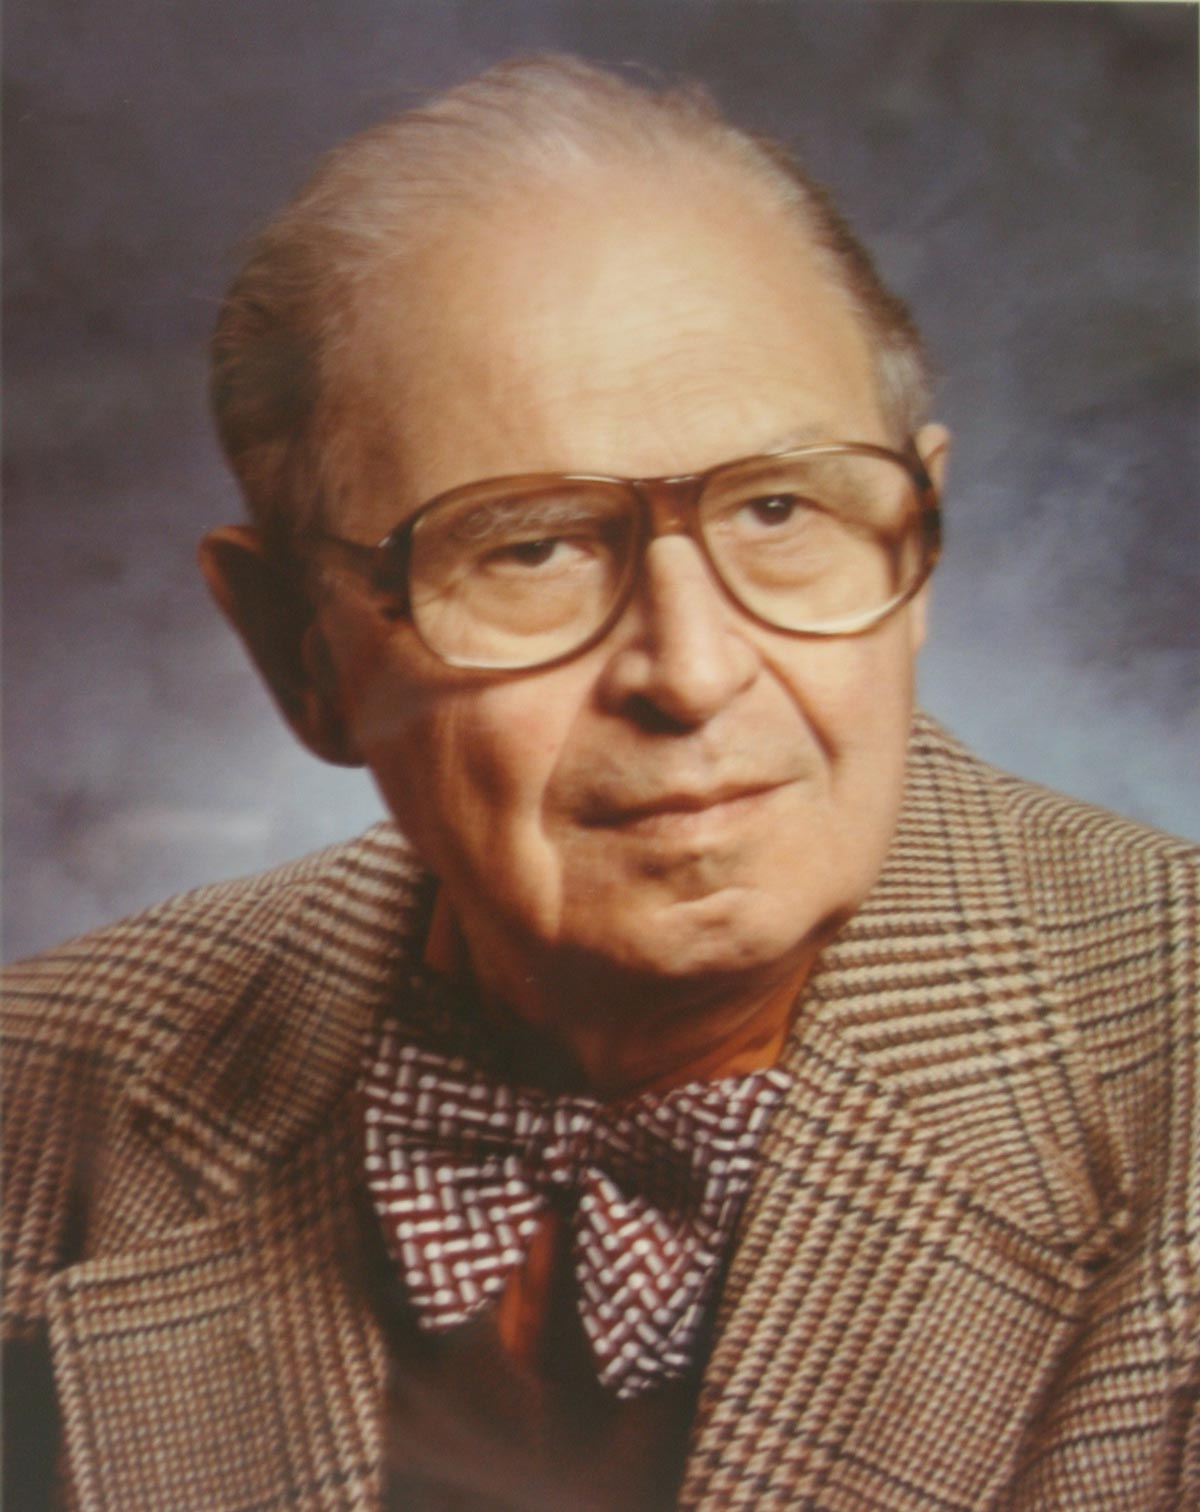 Max Wyman